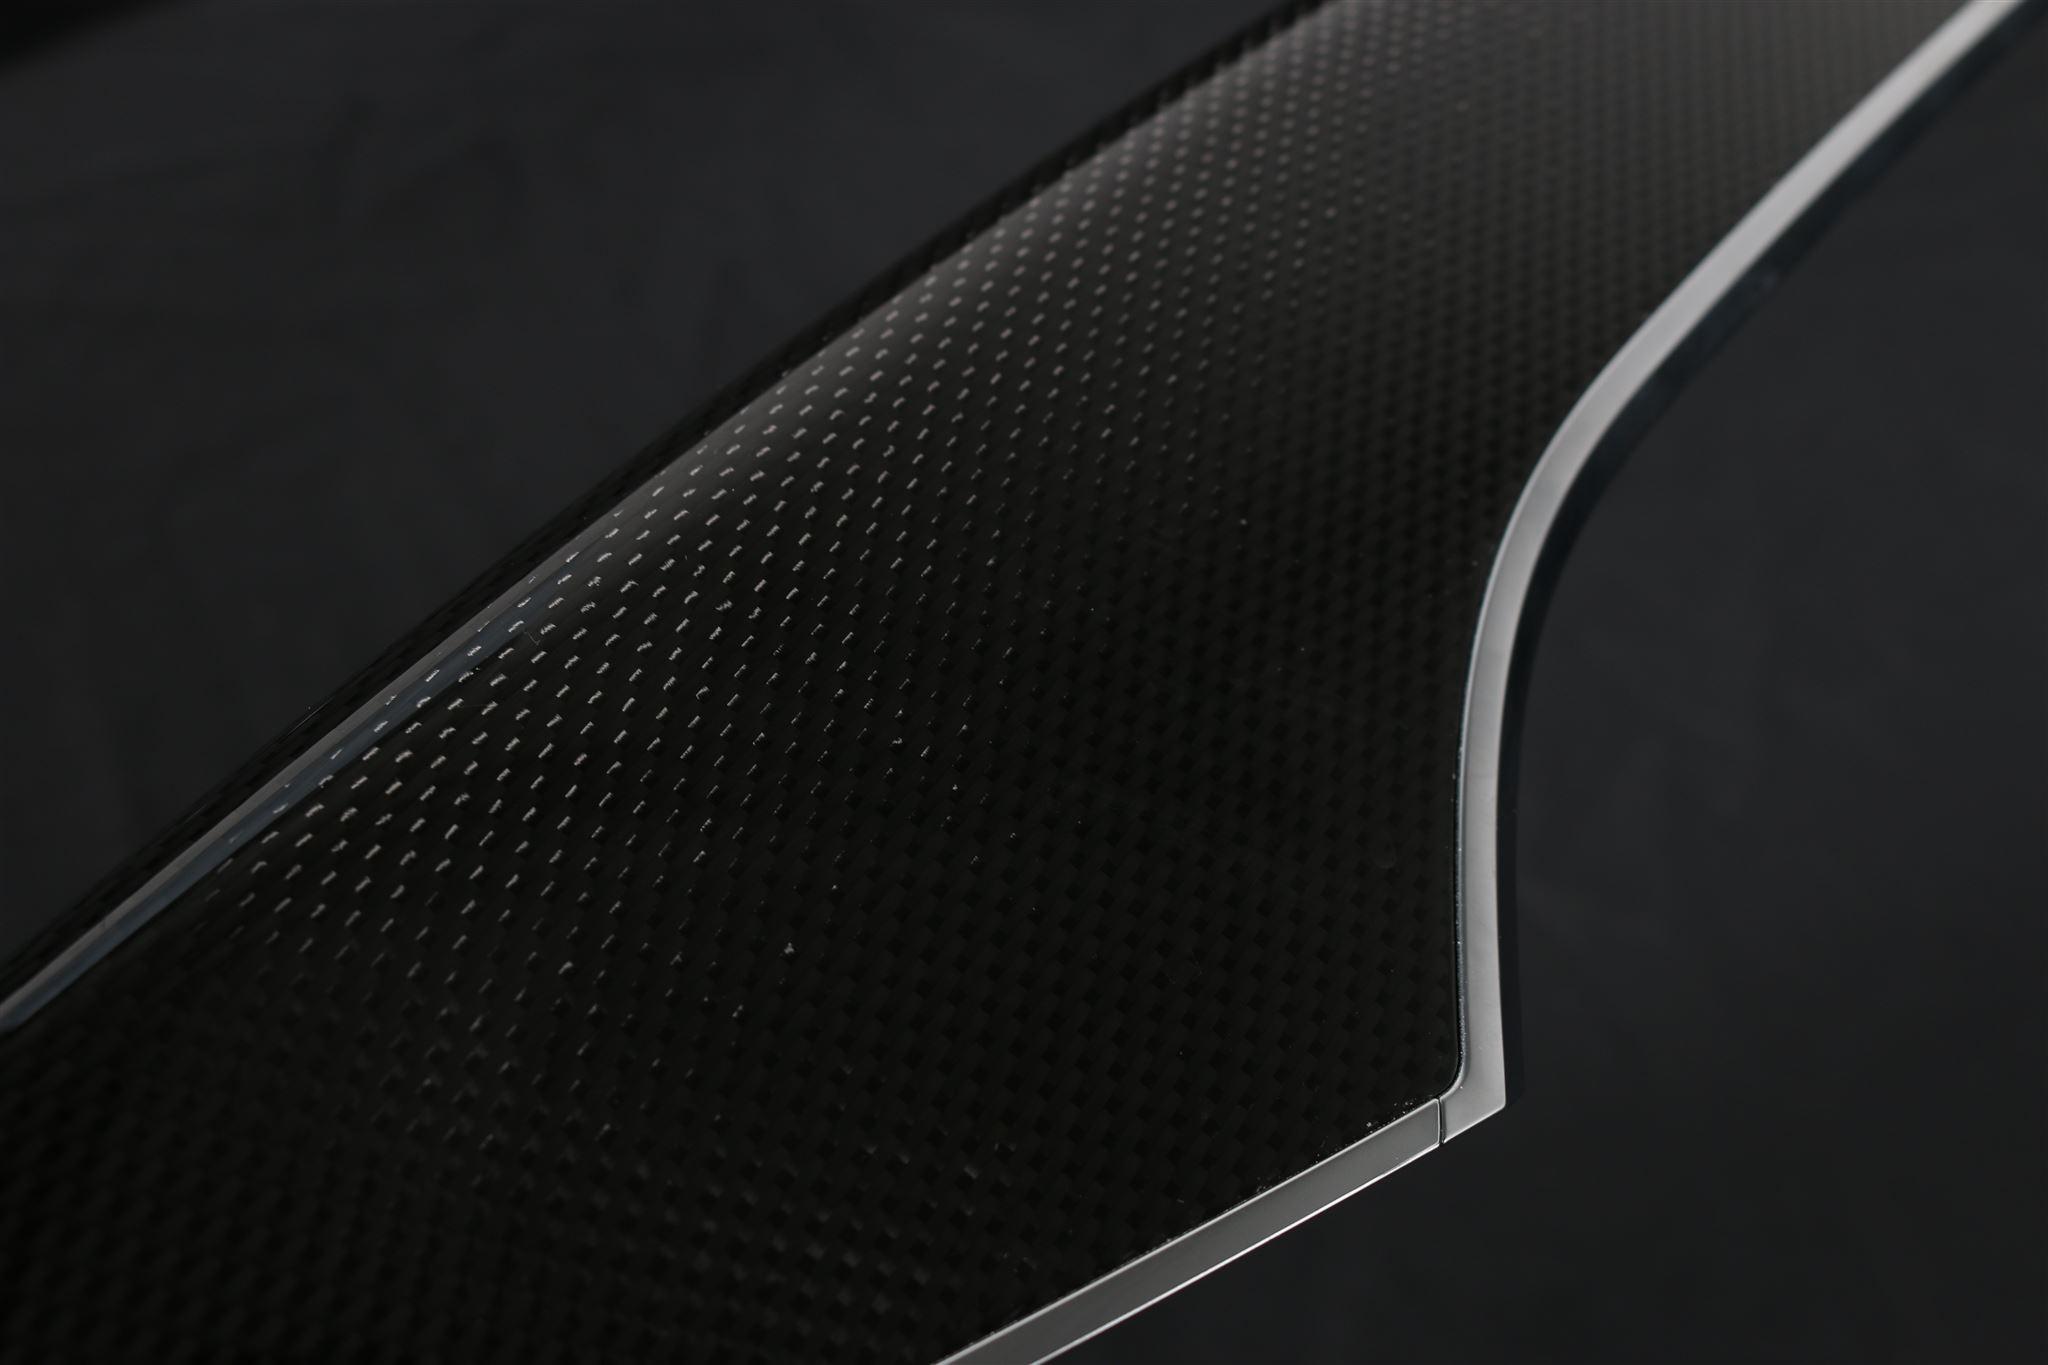 orig audi a6 s6 rs6 4g dekorleisten interieurleisten zierleisten carbon trim set ebay. Black Bedroom Furniture Sets. Home Design Ideas